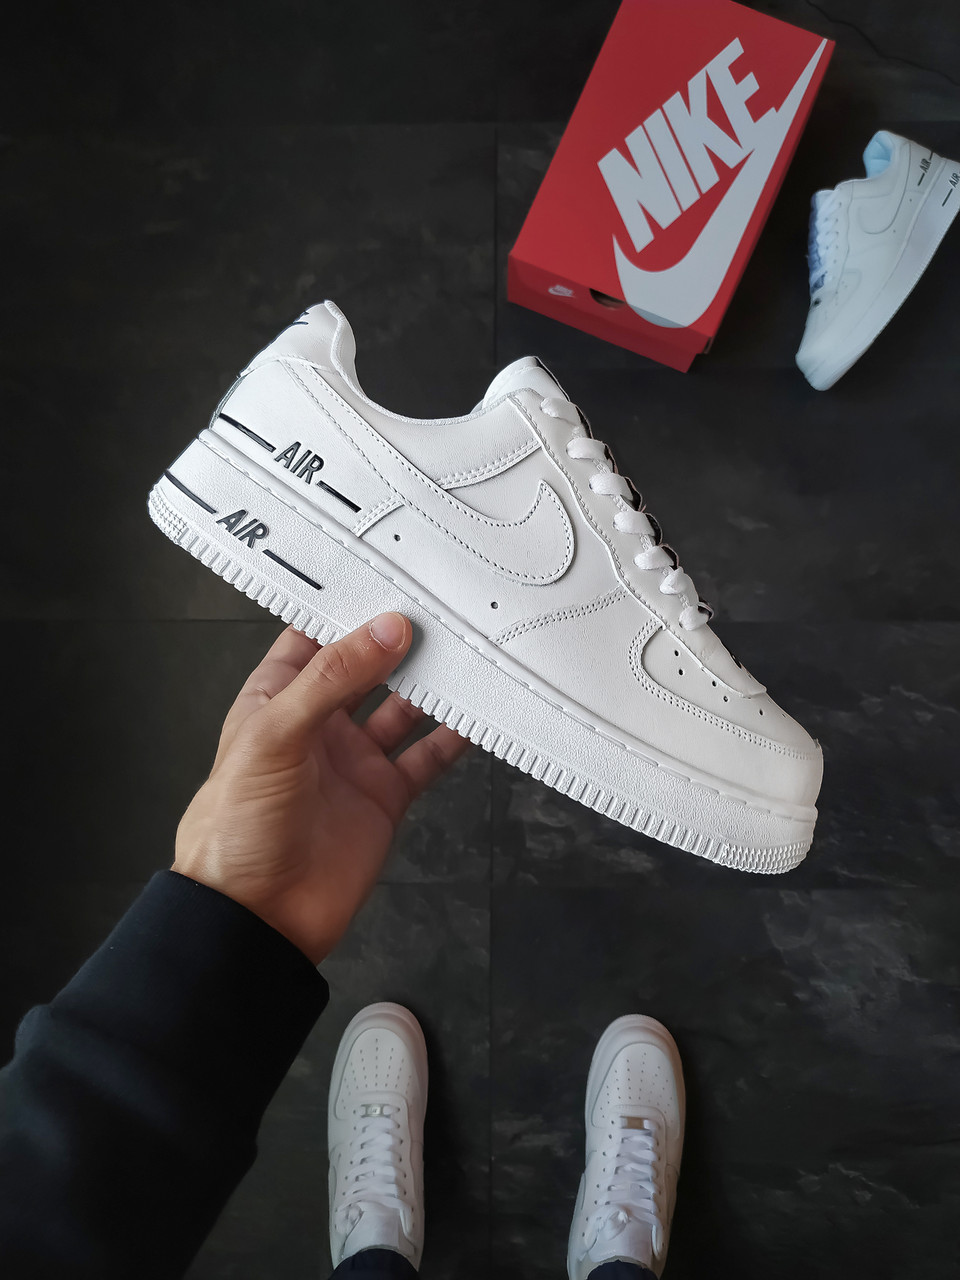 Мужские кроссовки Nike Air Force 1 Added Air белые